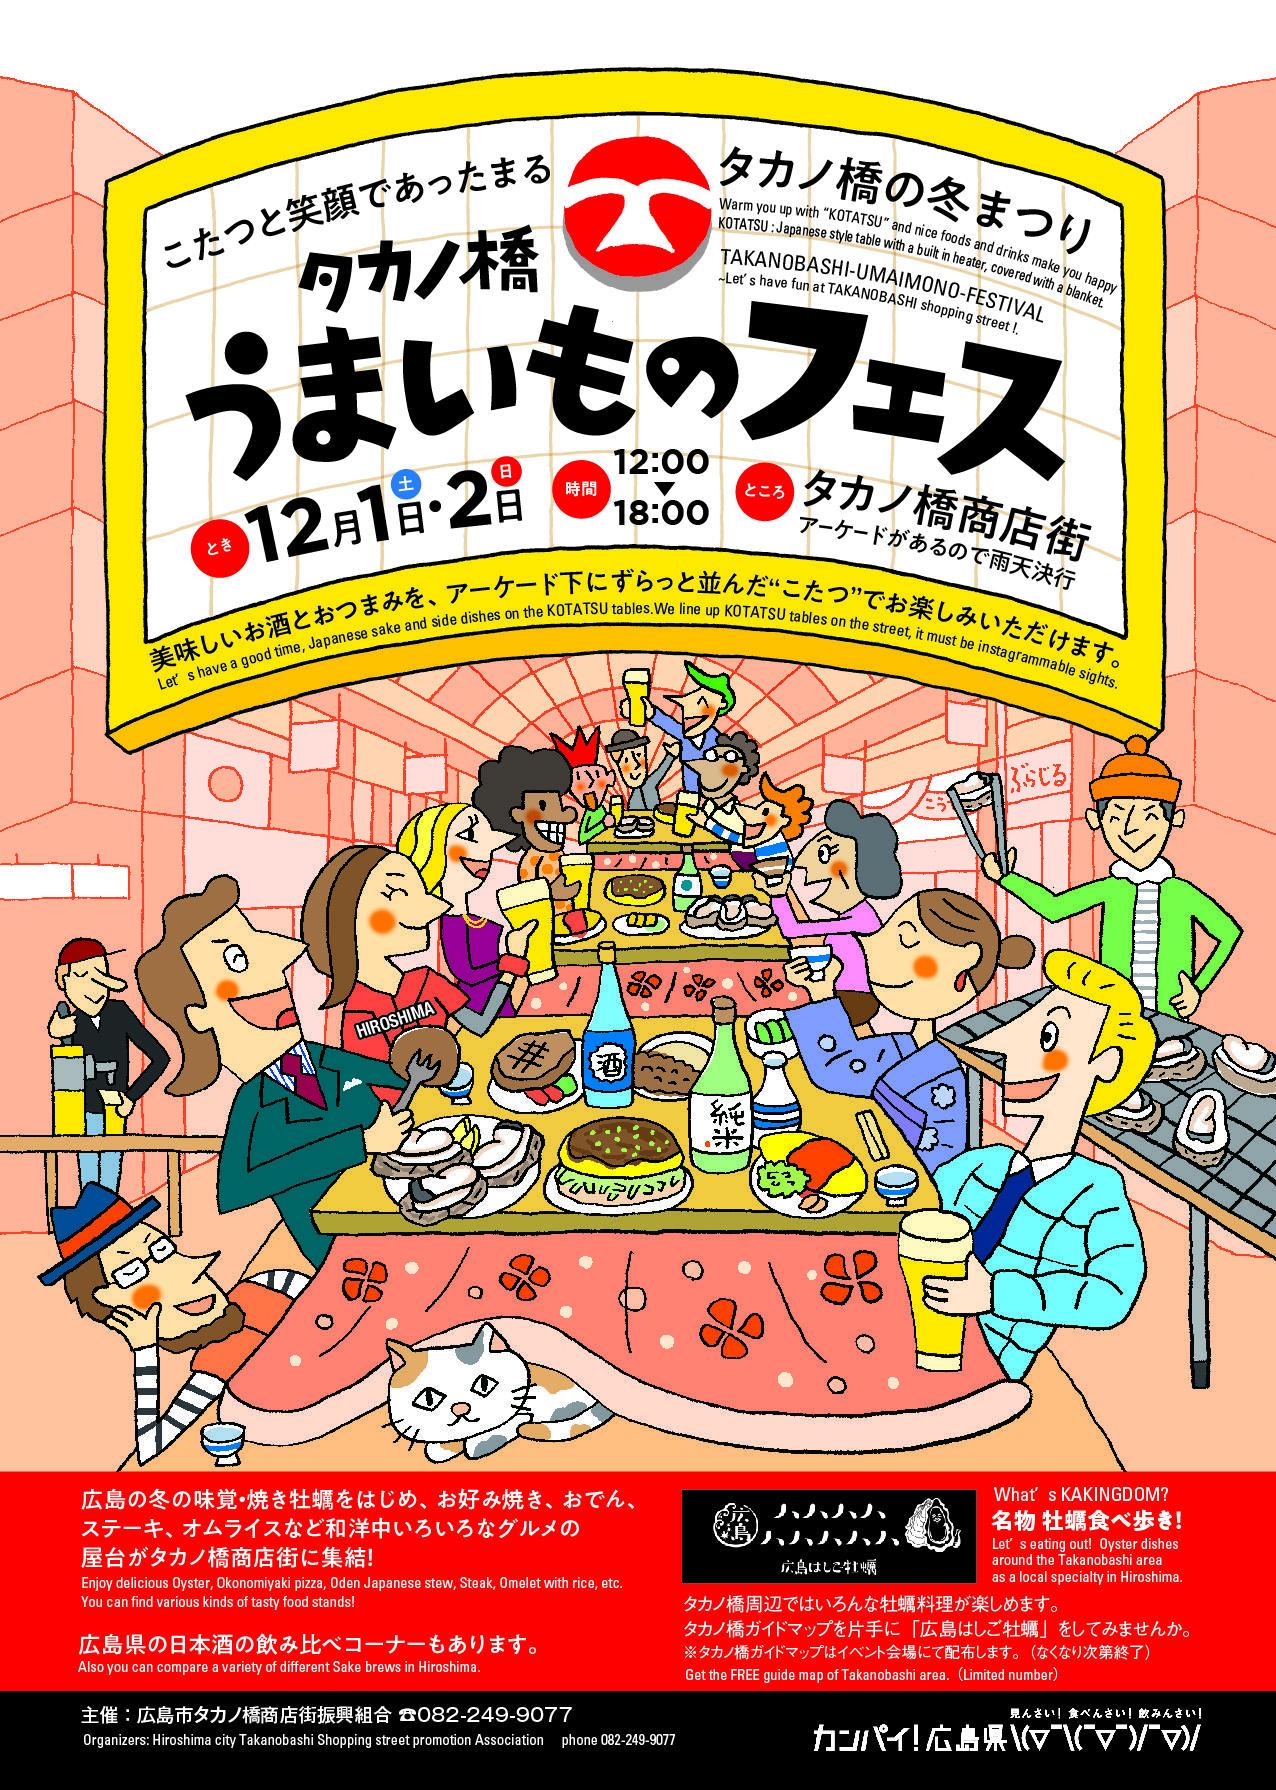 http://coaki.jp/hiroshima/takanobashi_umaimono_1.jpg